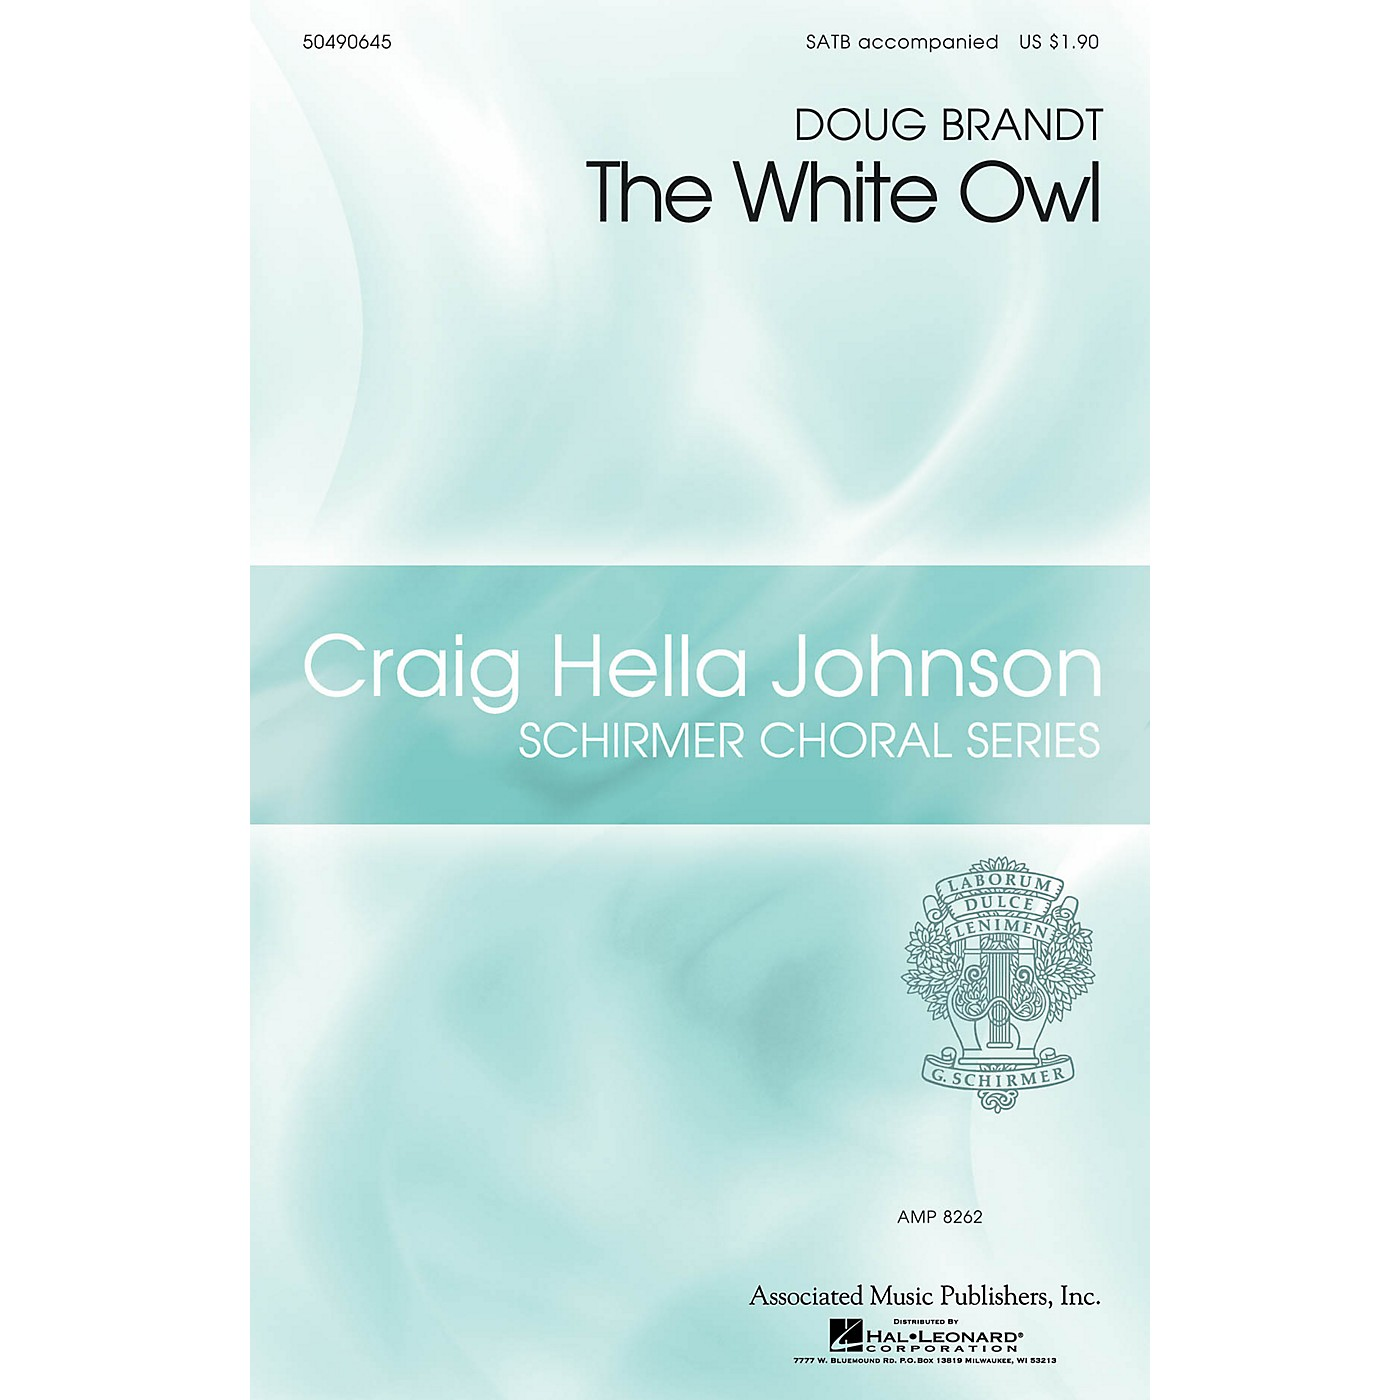 G. Schirmer The White Owl (Craig Hella Johnson Choral Series) SATB composed by Doug Brandt thumbnail